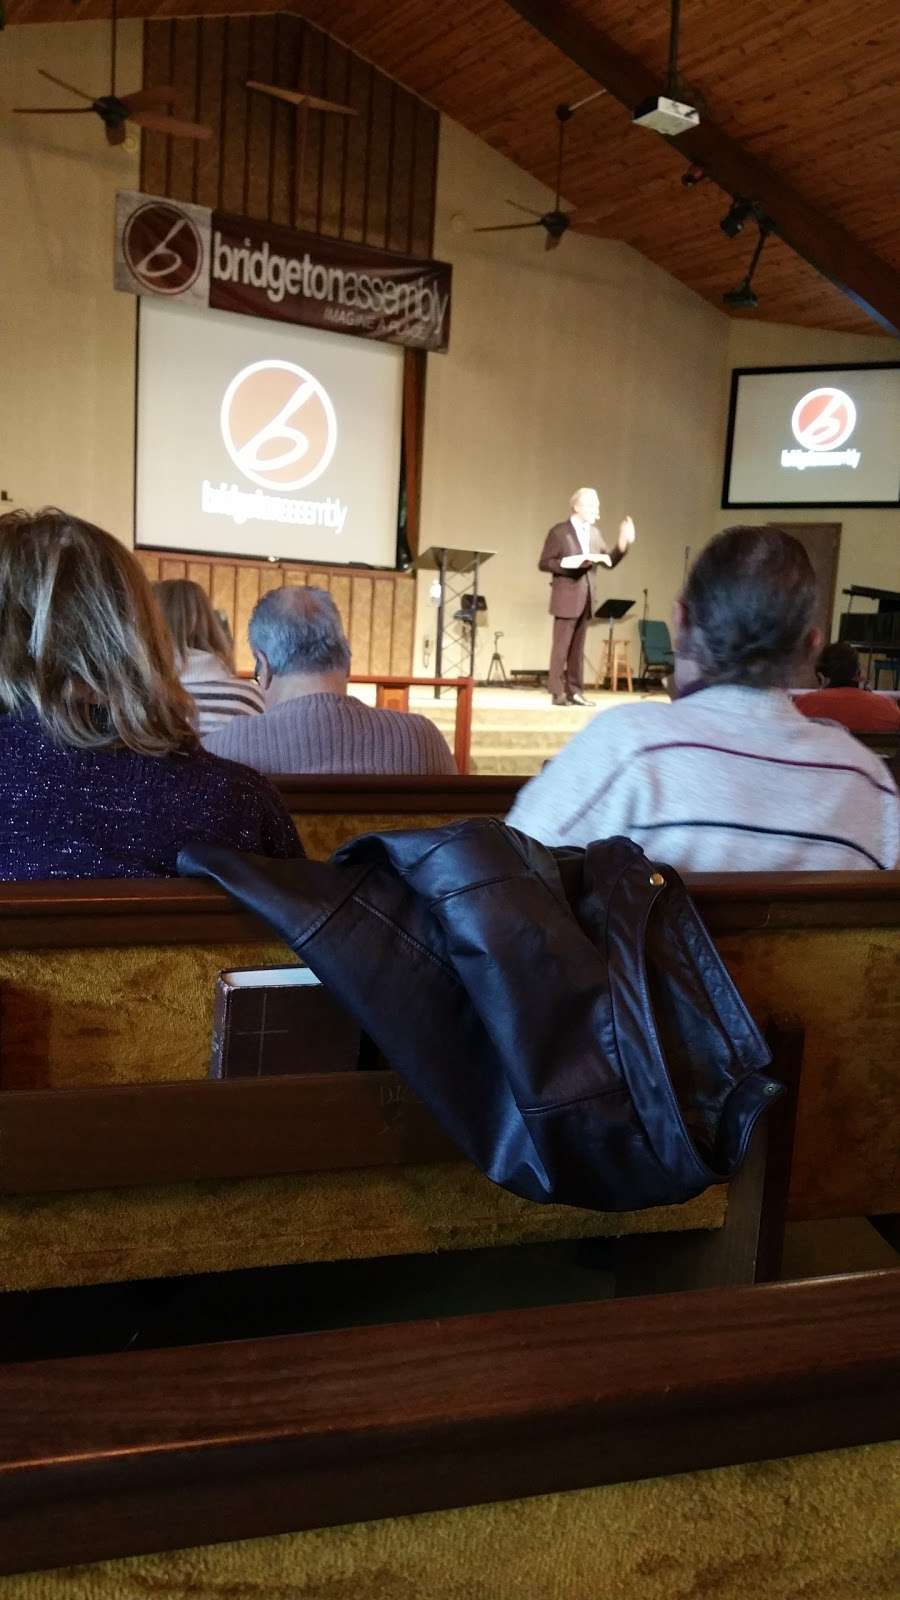 Bridgeton Assembly of God - church  | Photo 1 of 1 | Address: 424 Indian Ave, Bridgeton, NJ 08302, USA | Phone: (856) 451-5763